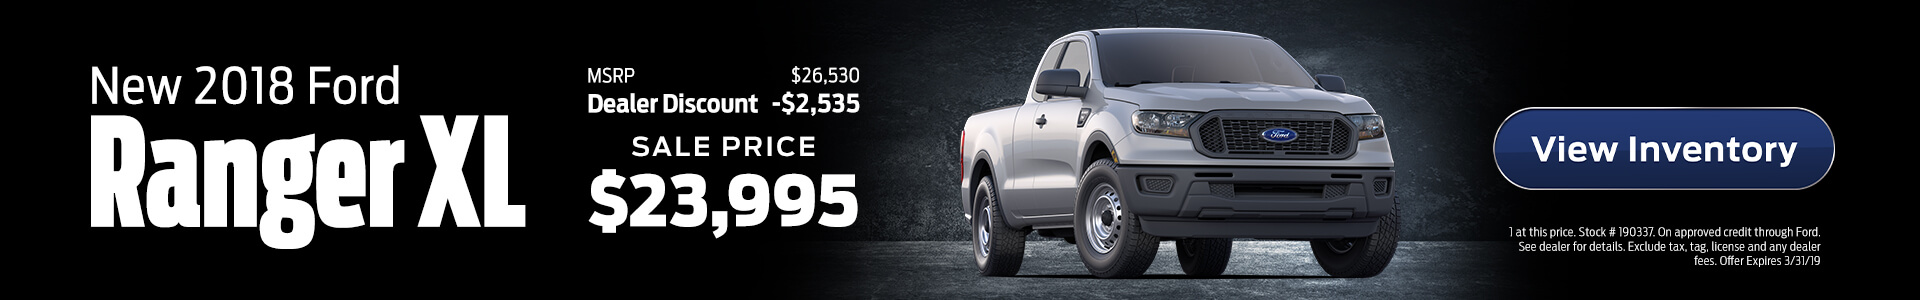 Ford Ranger $23,995 Purchase